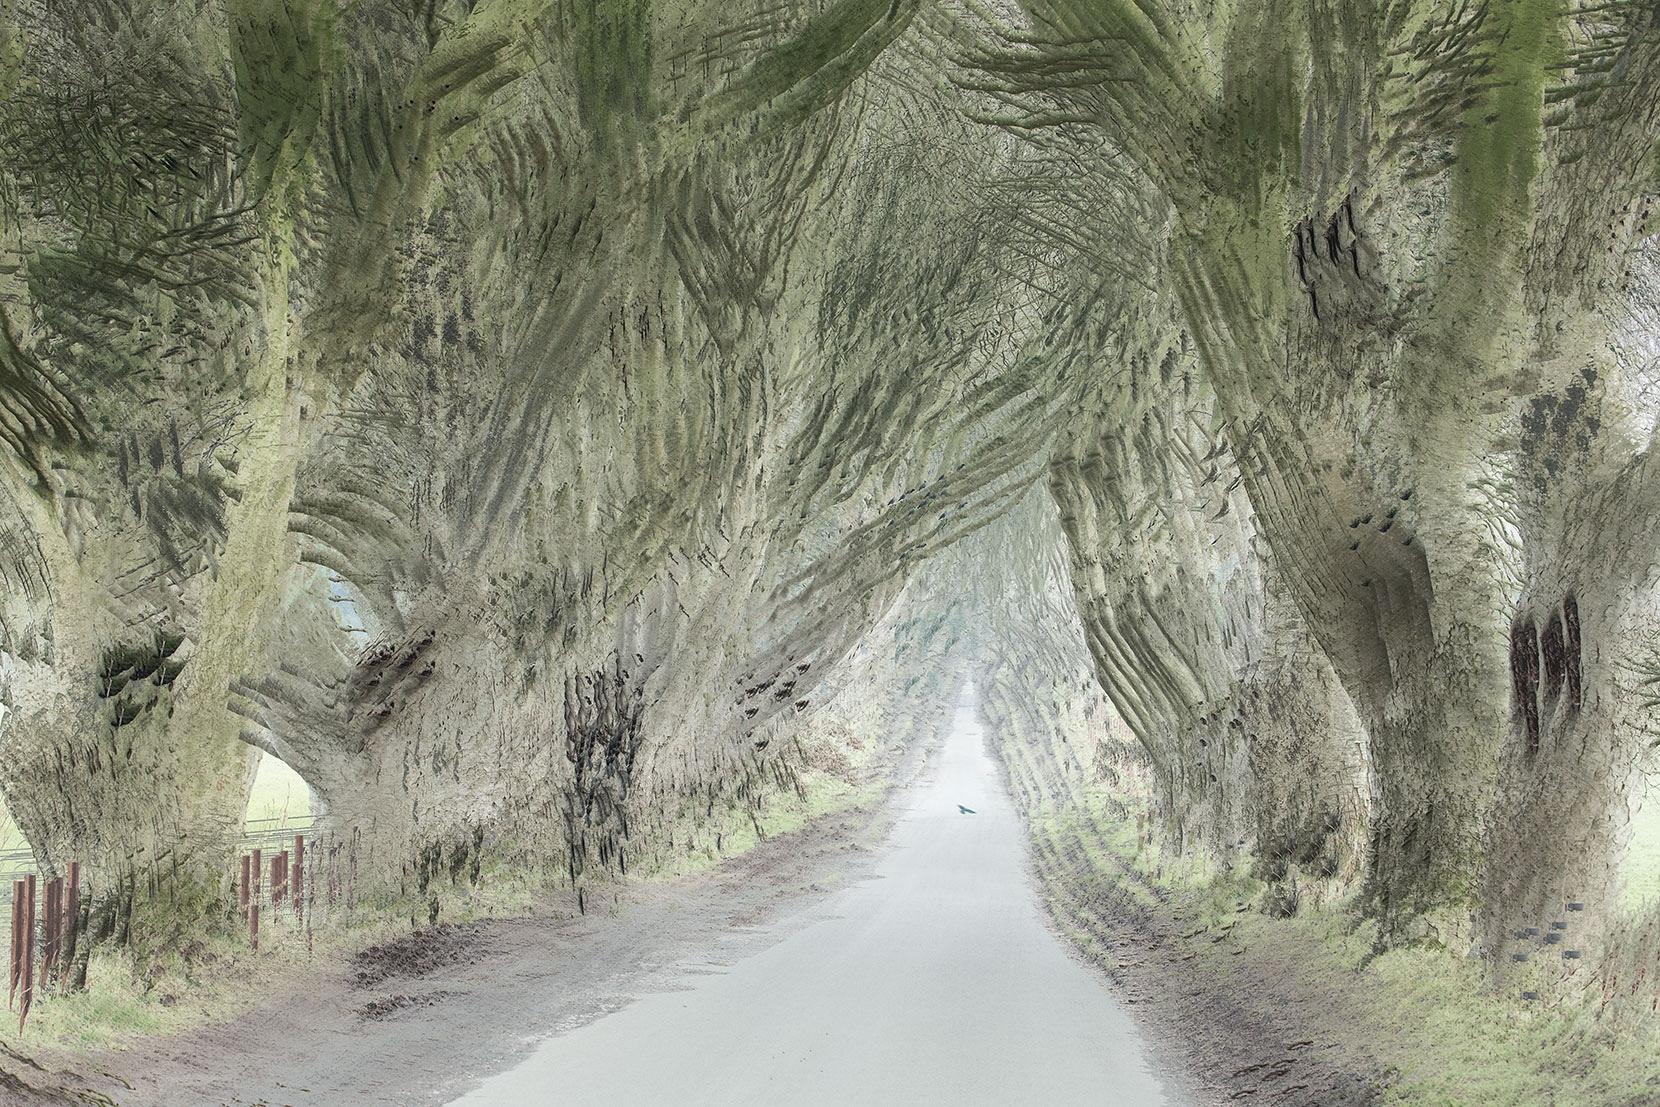 Dark Hedges in Northern Ireland, an alternative take using 9 multiple exposures